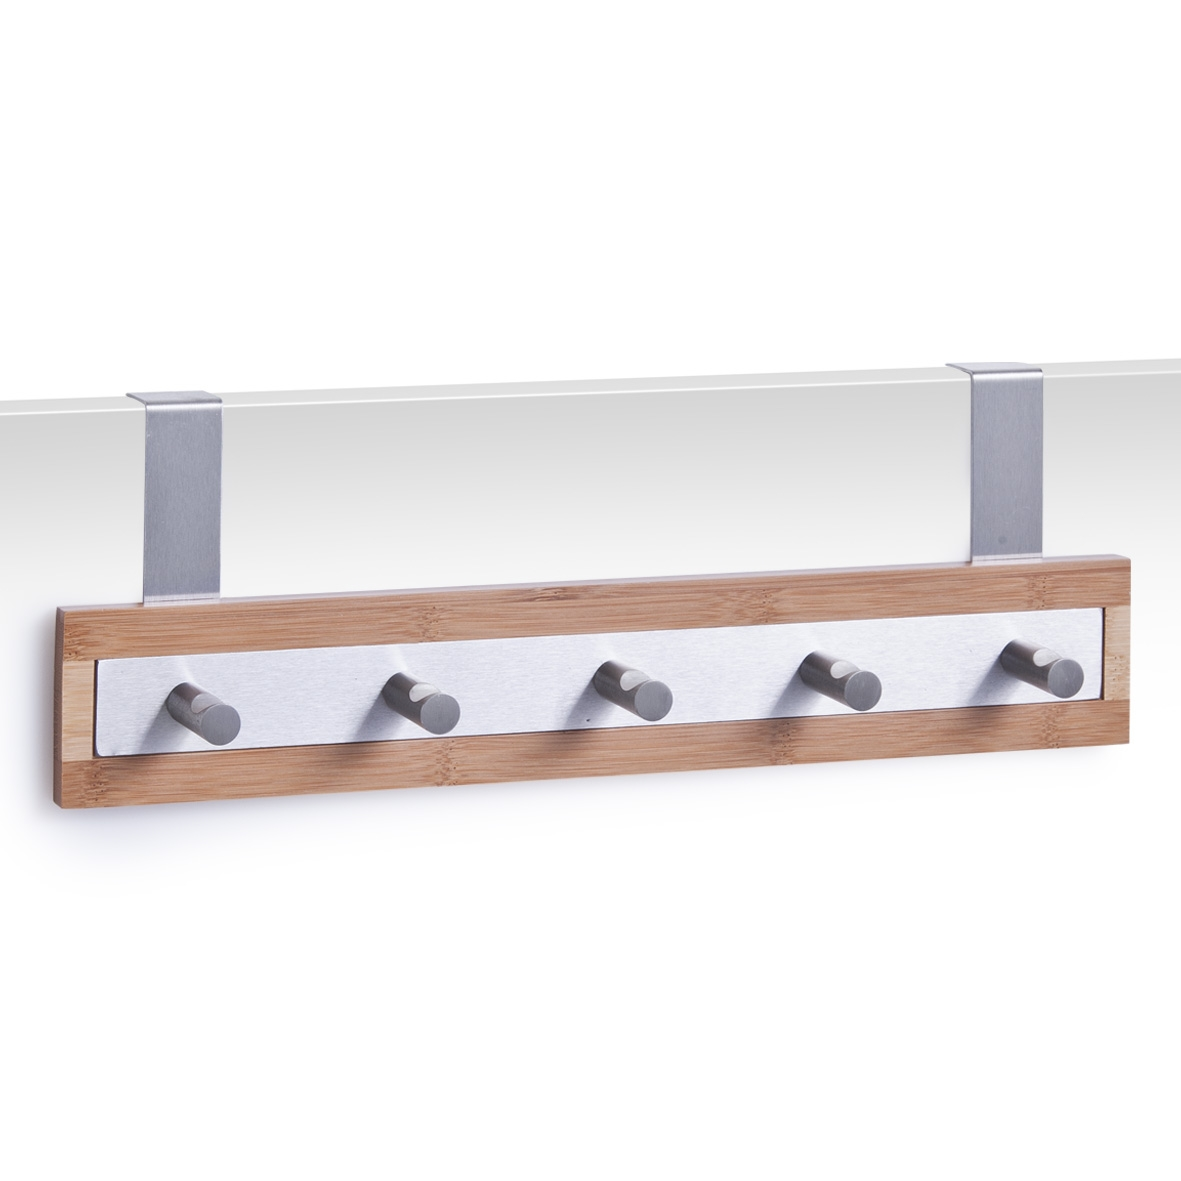 Cuier pentru usa, din metal si bambus, Scandi Natural, l36xA6xH12 cm